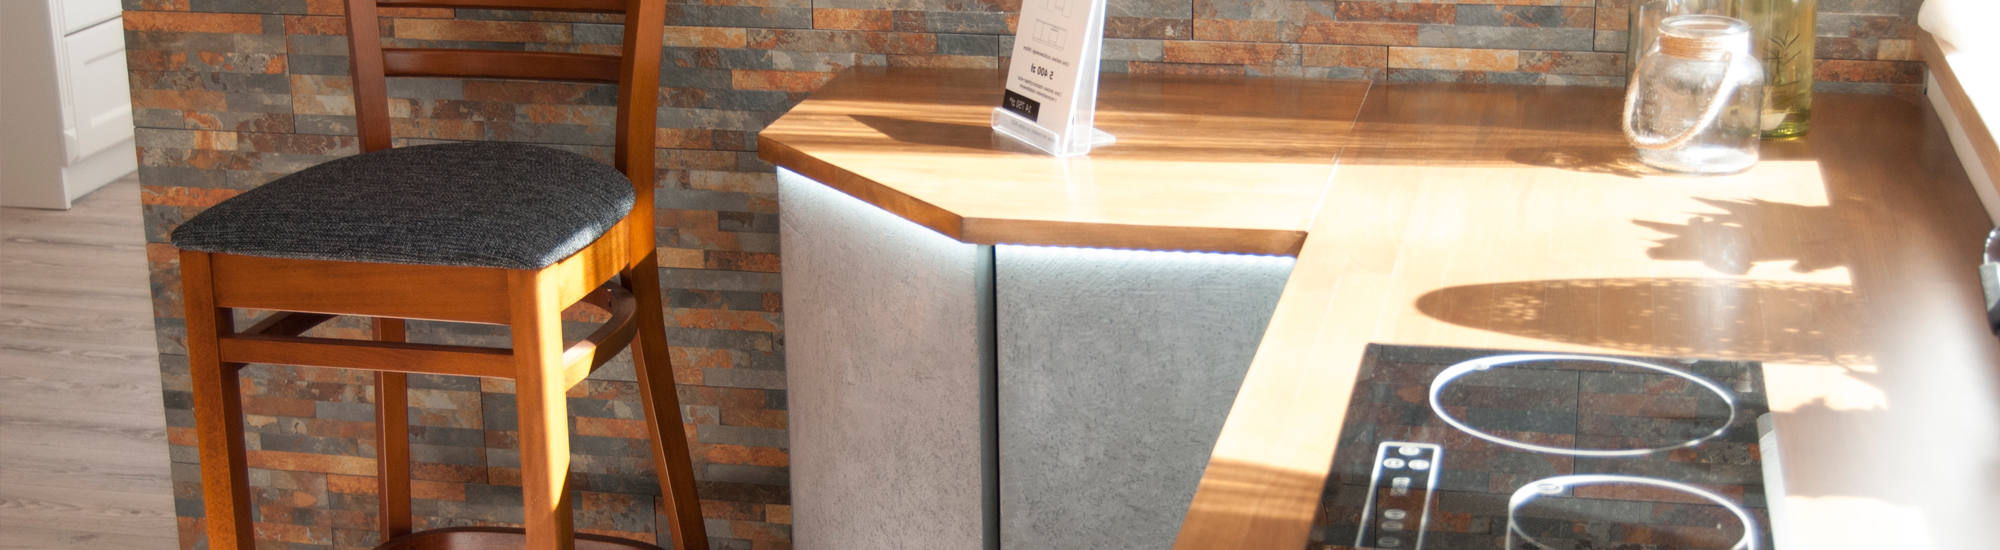 meble-z-betonu1